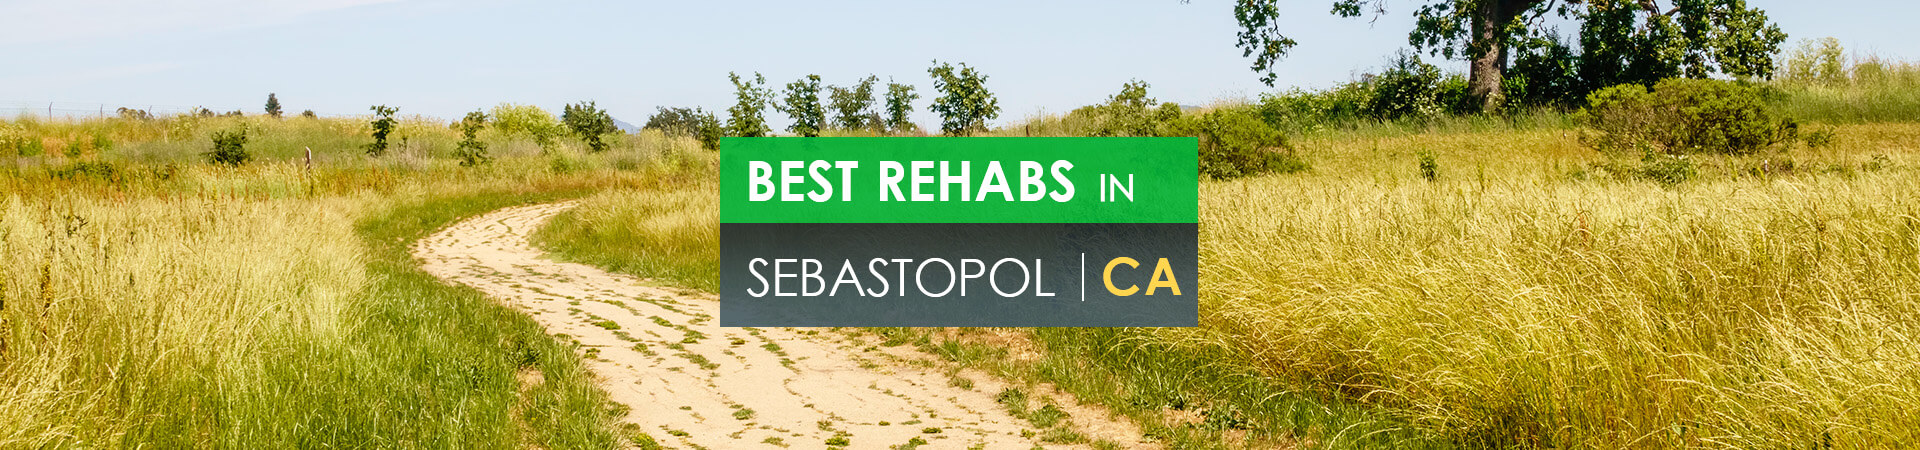 Best rehabs in Sebastopol, CA